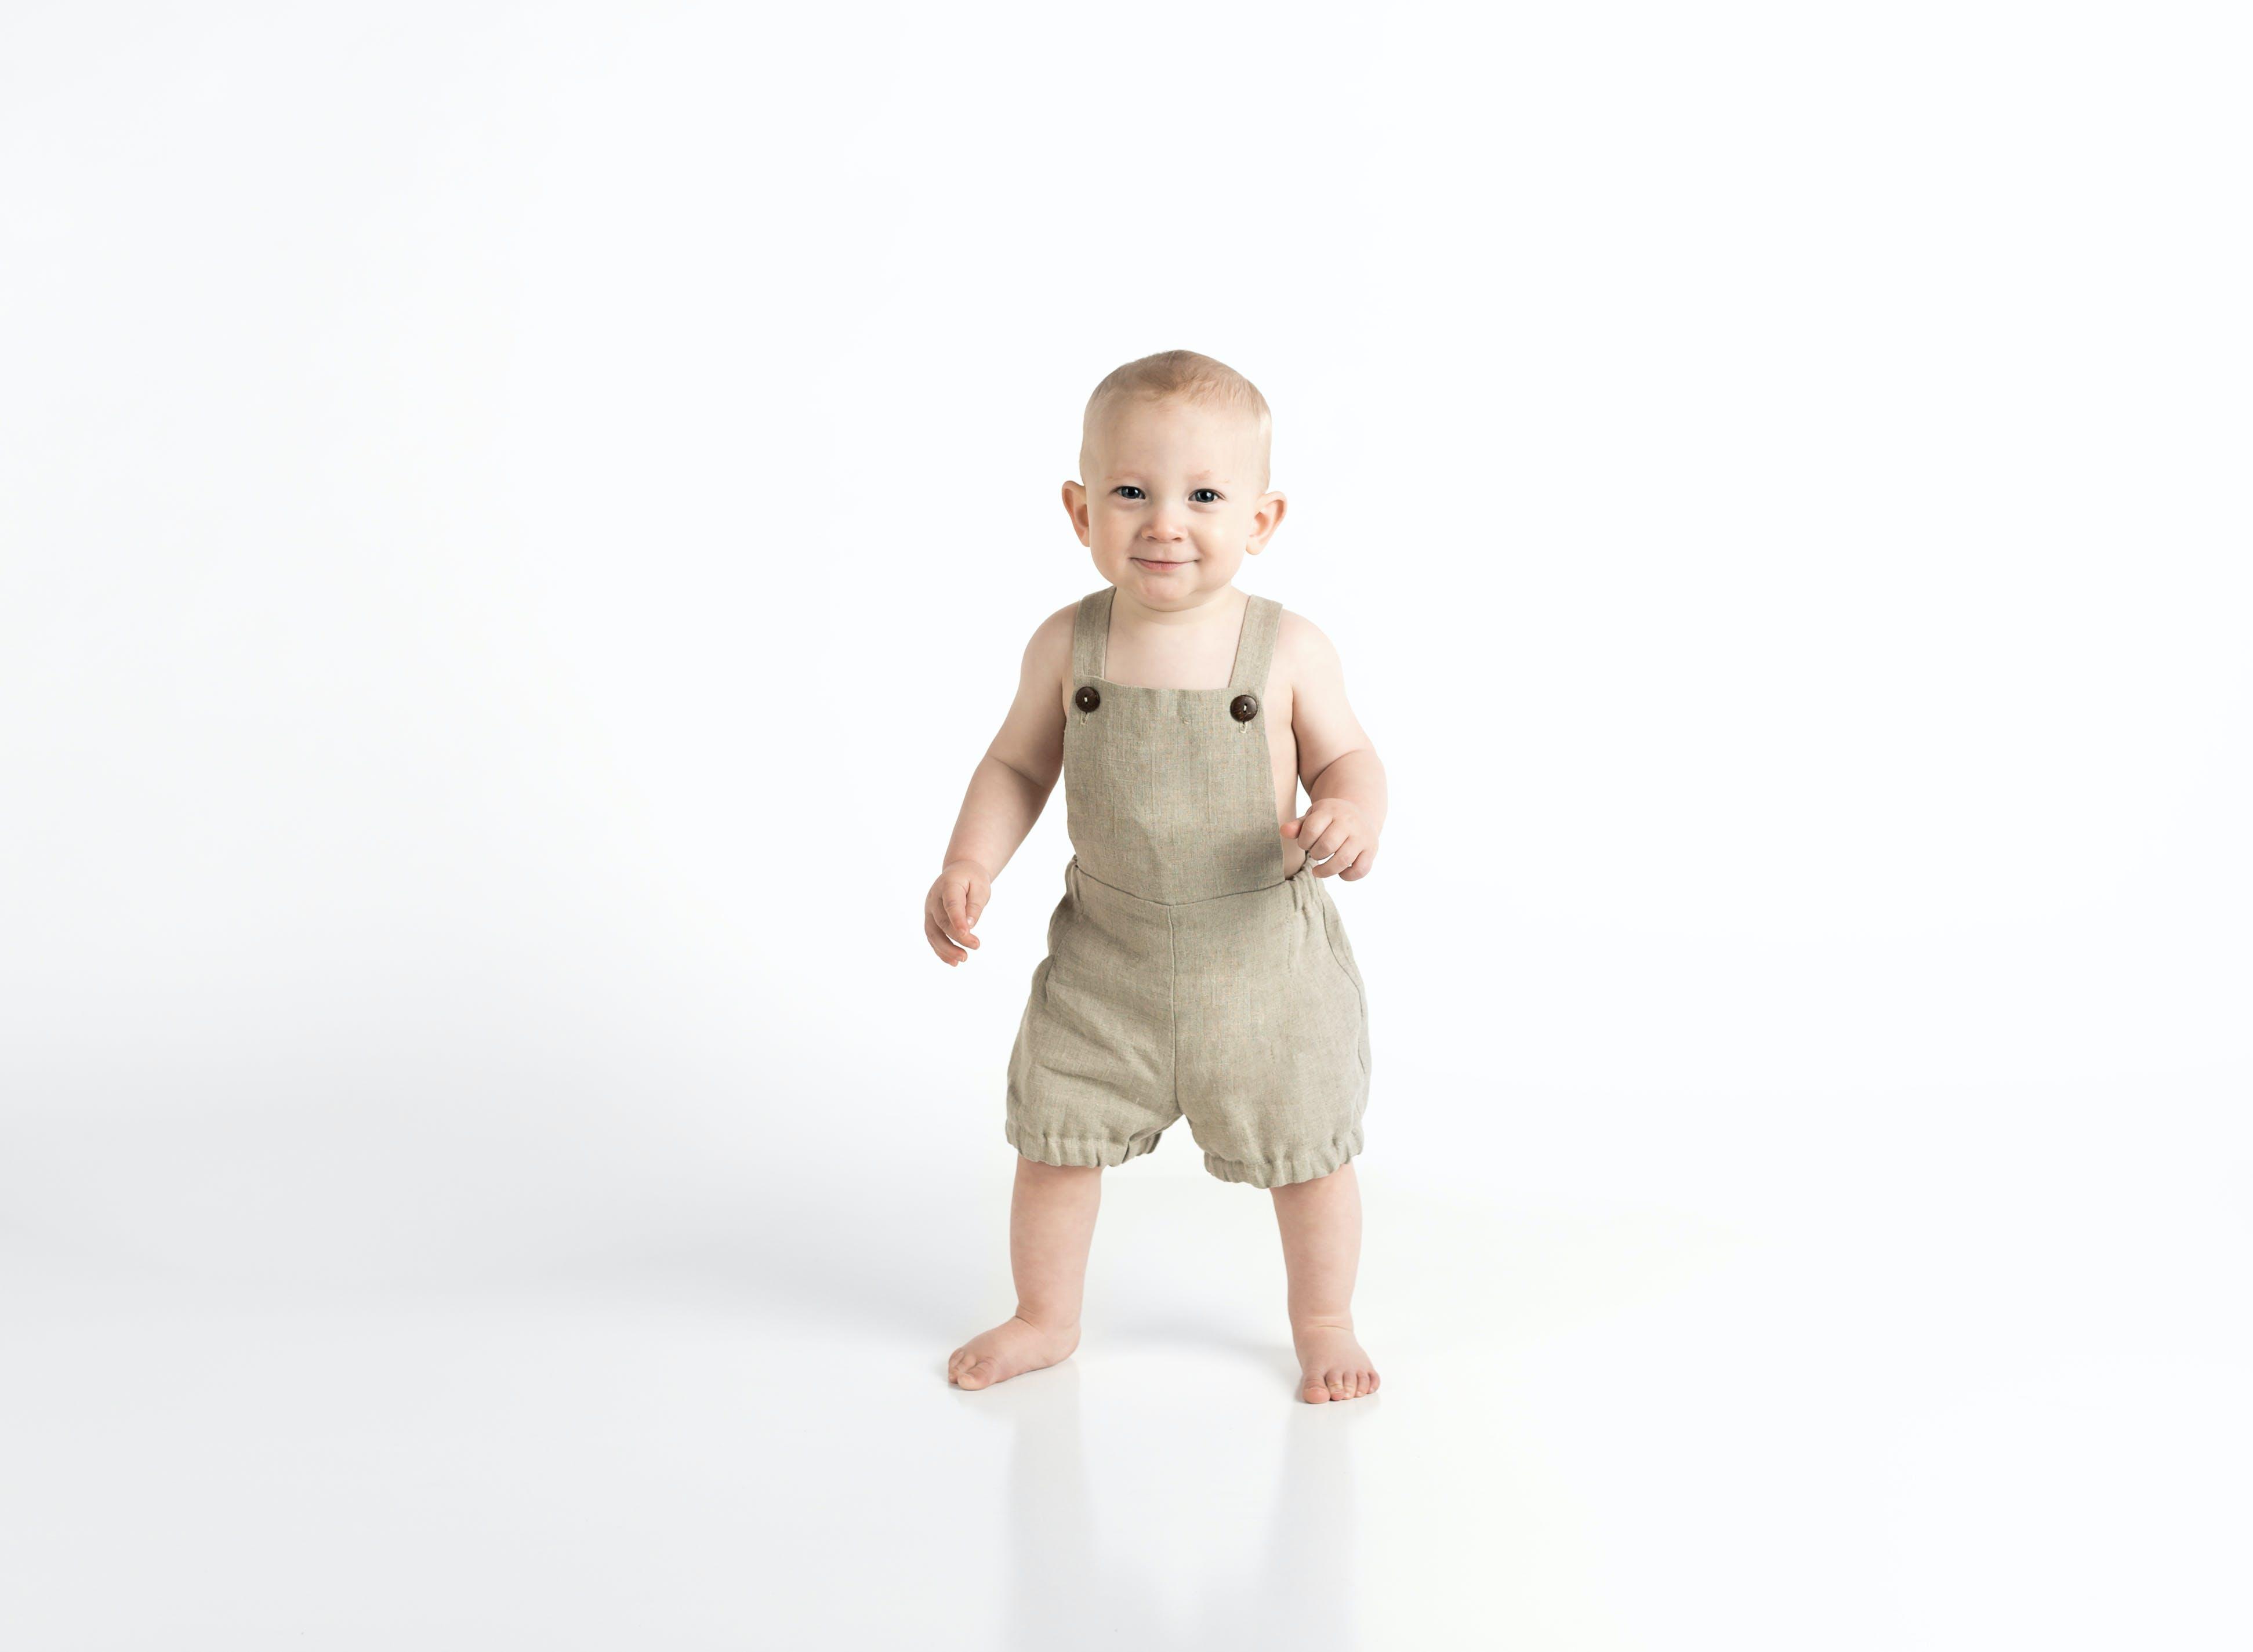 Kostenloses Stock Foto zu baby, bezaubernd, freude, kind